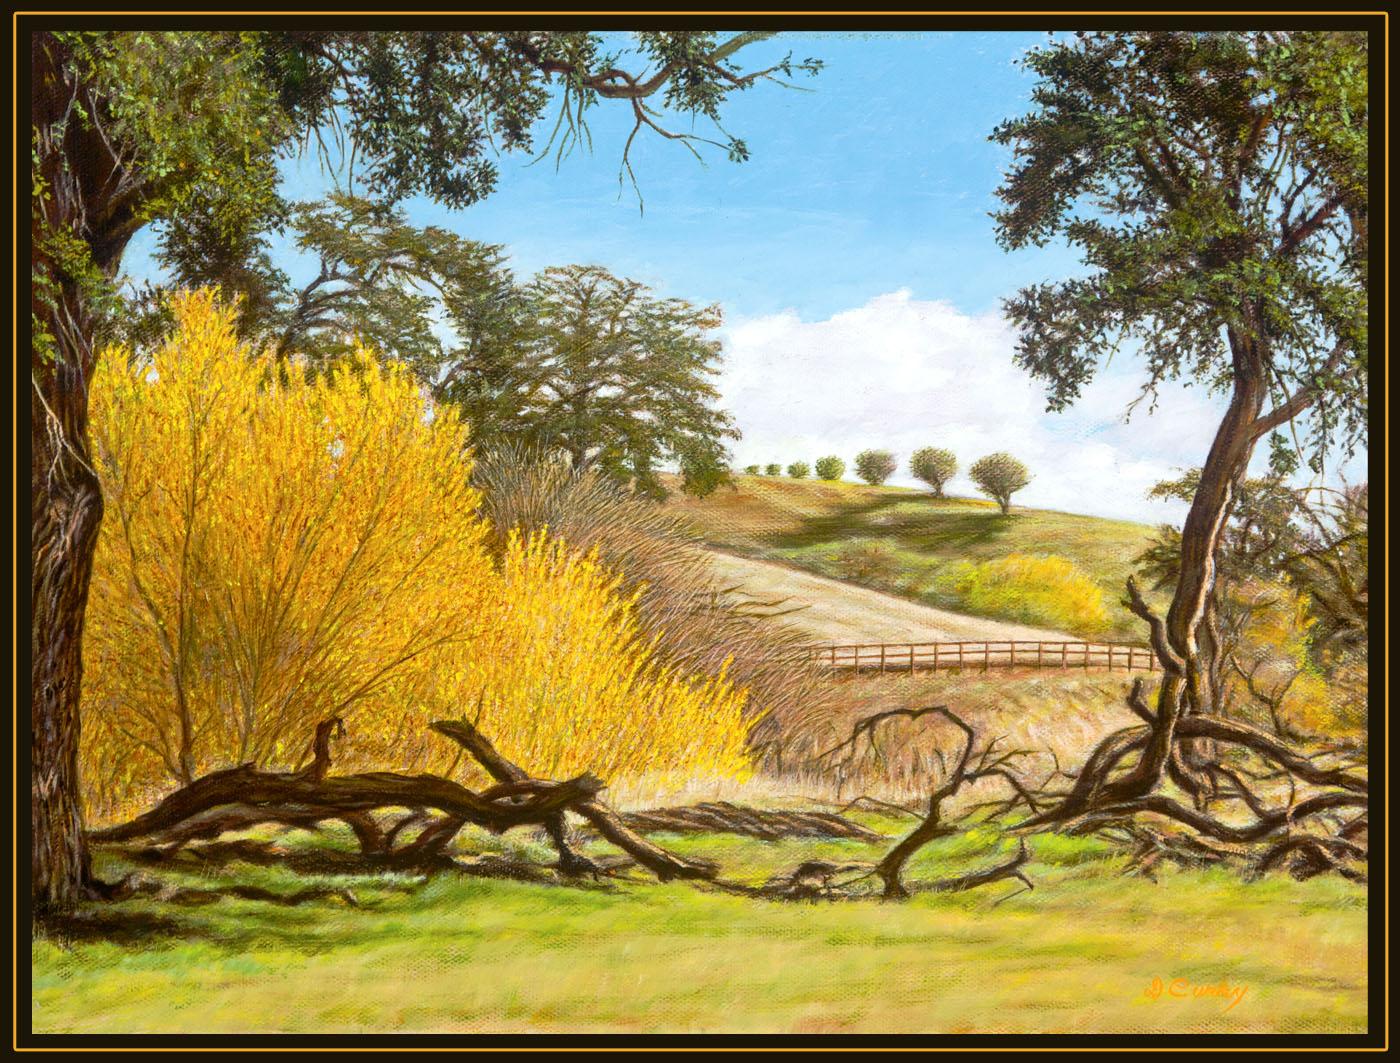 """Along the Huerhuero"" by Dennis Curry"